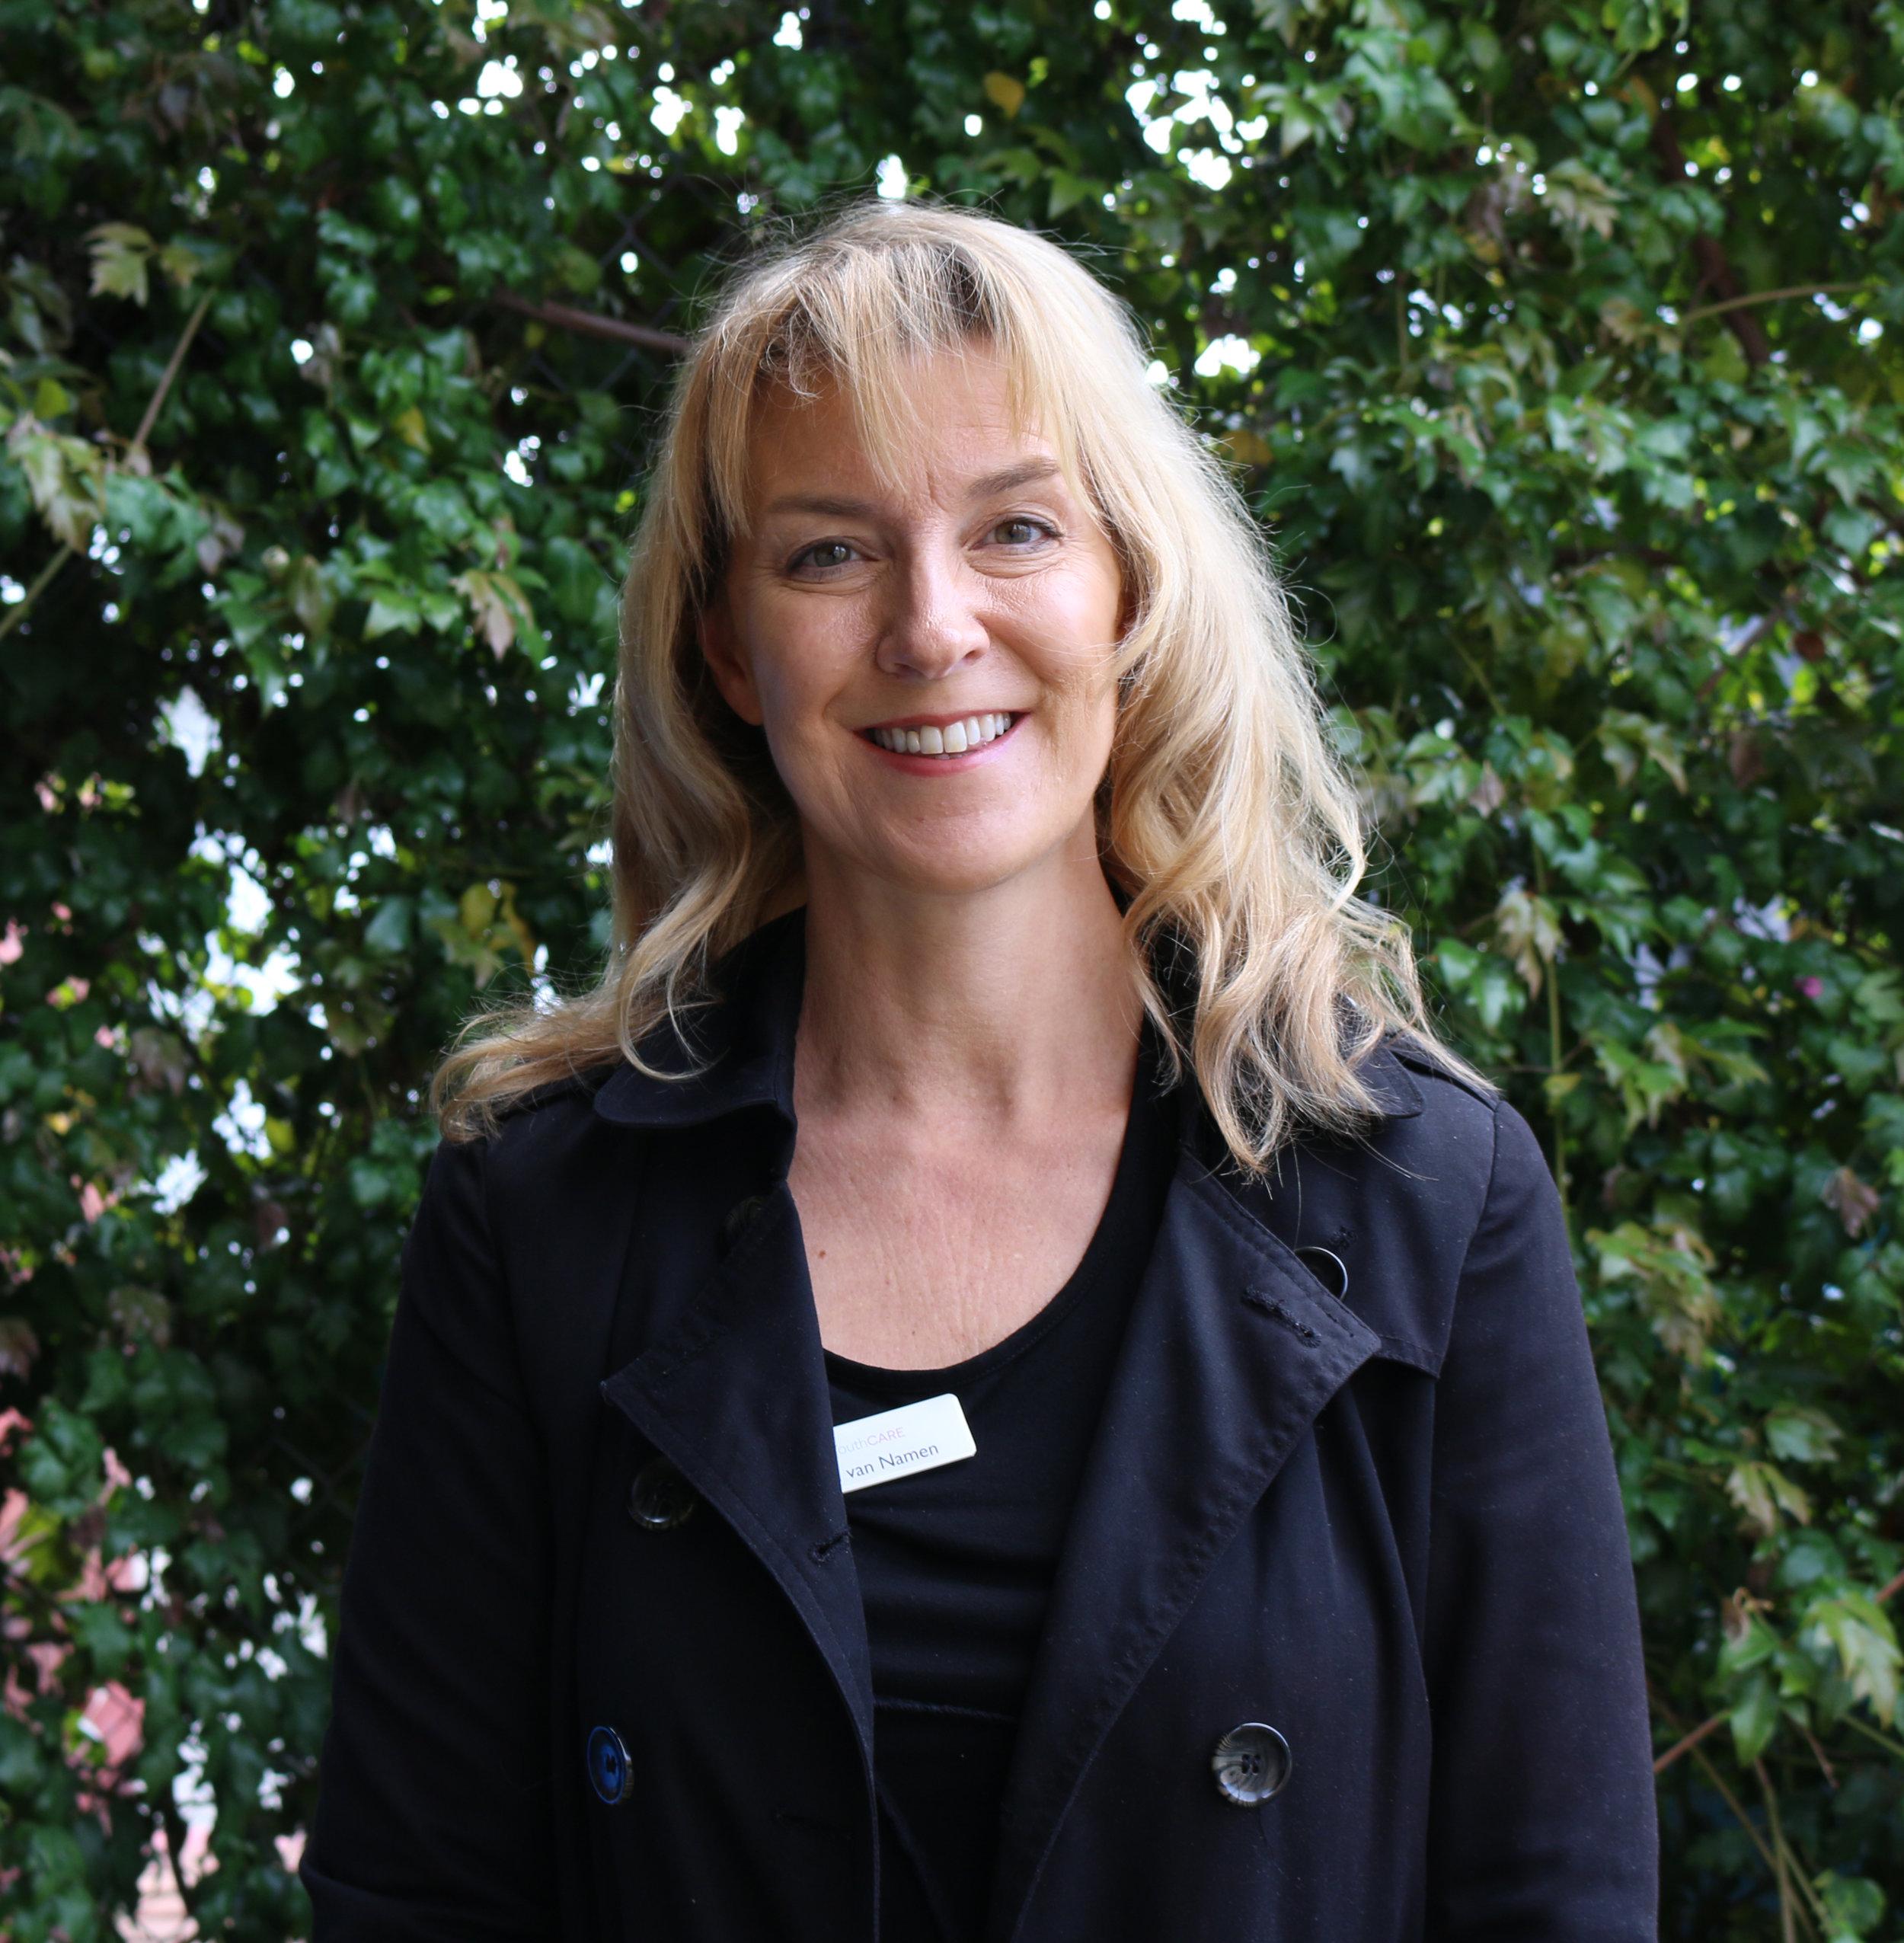 Karen van Namen Headshot.jpg